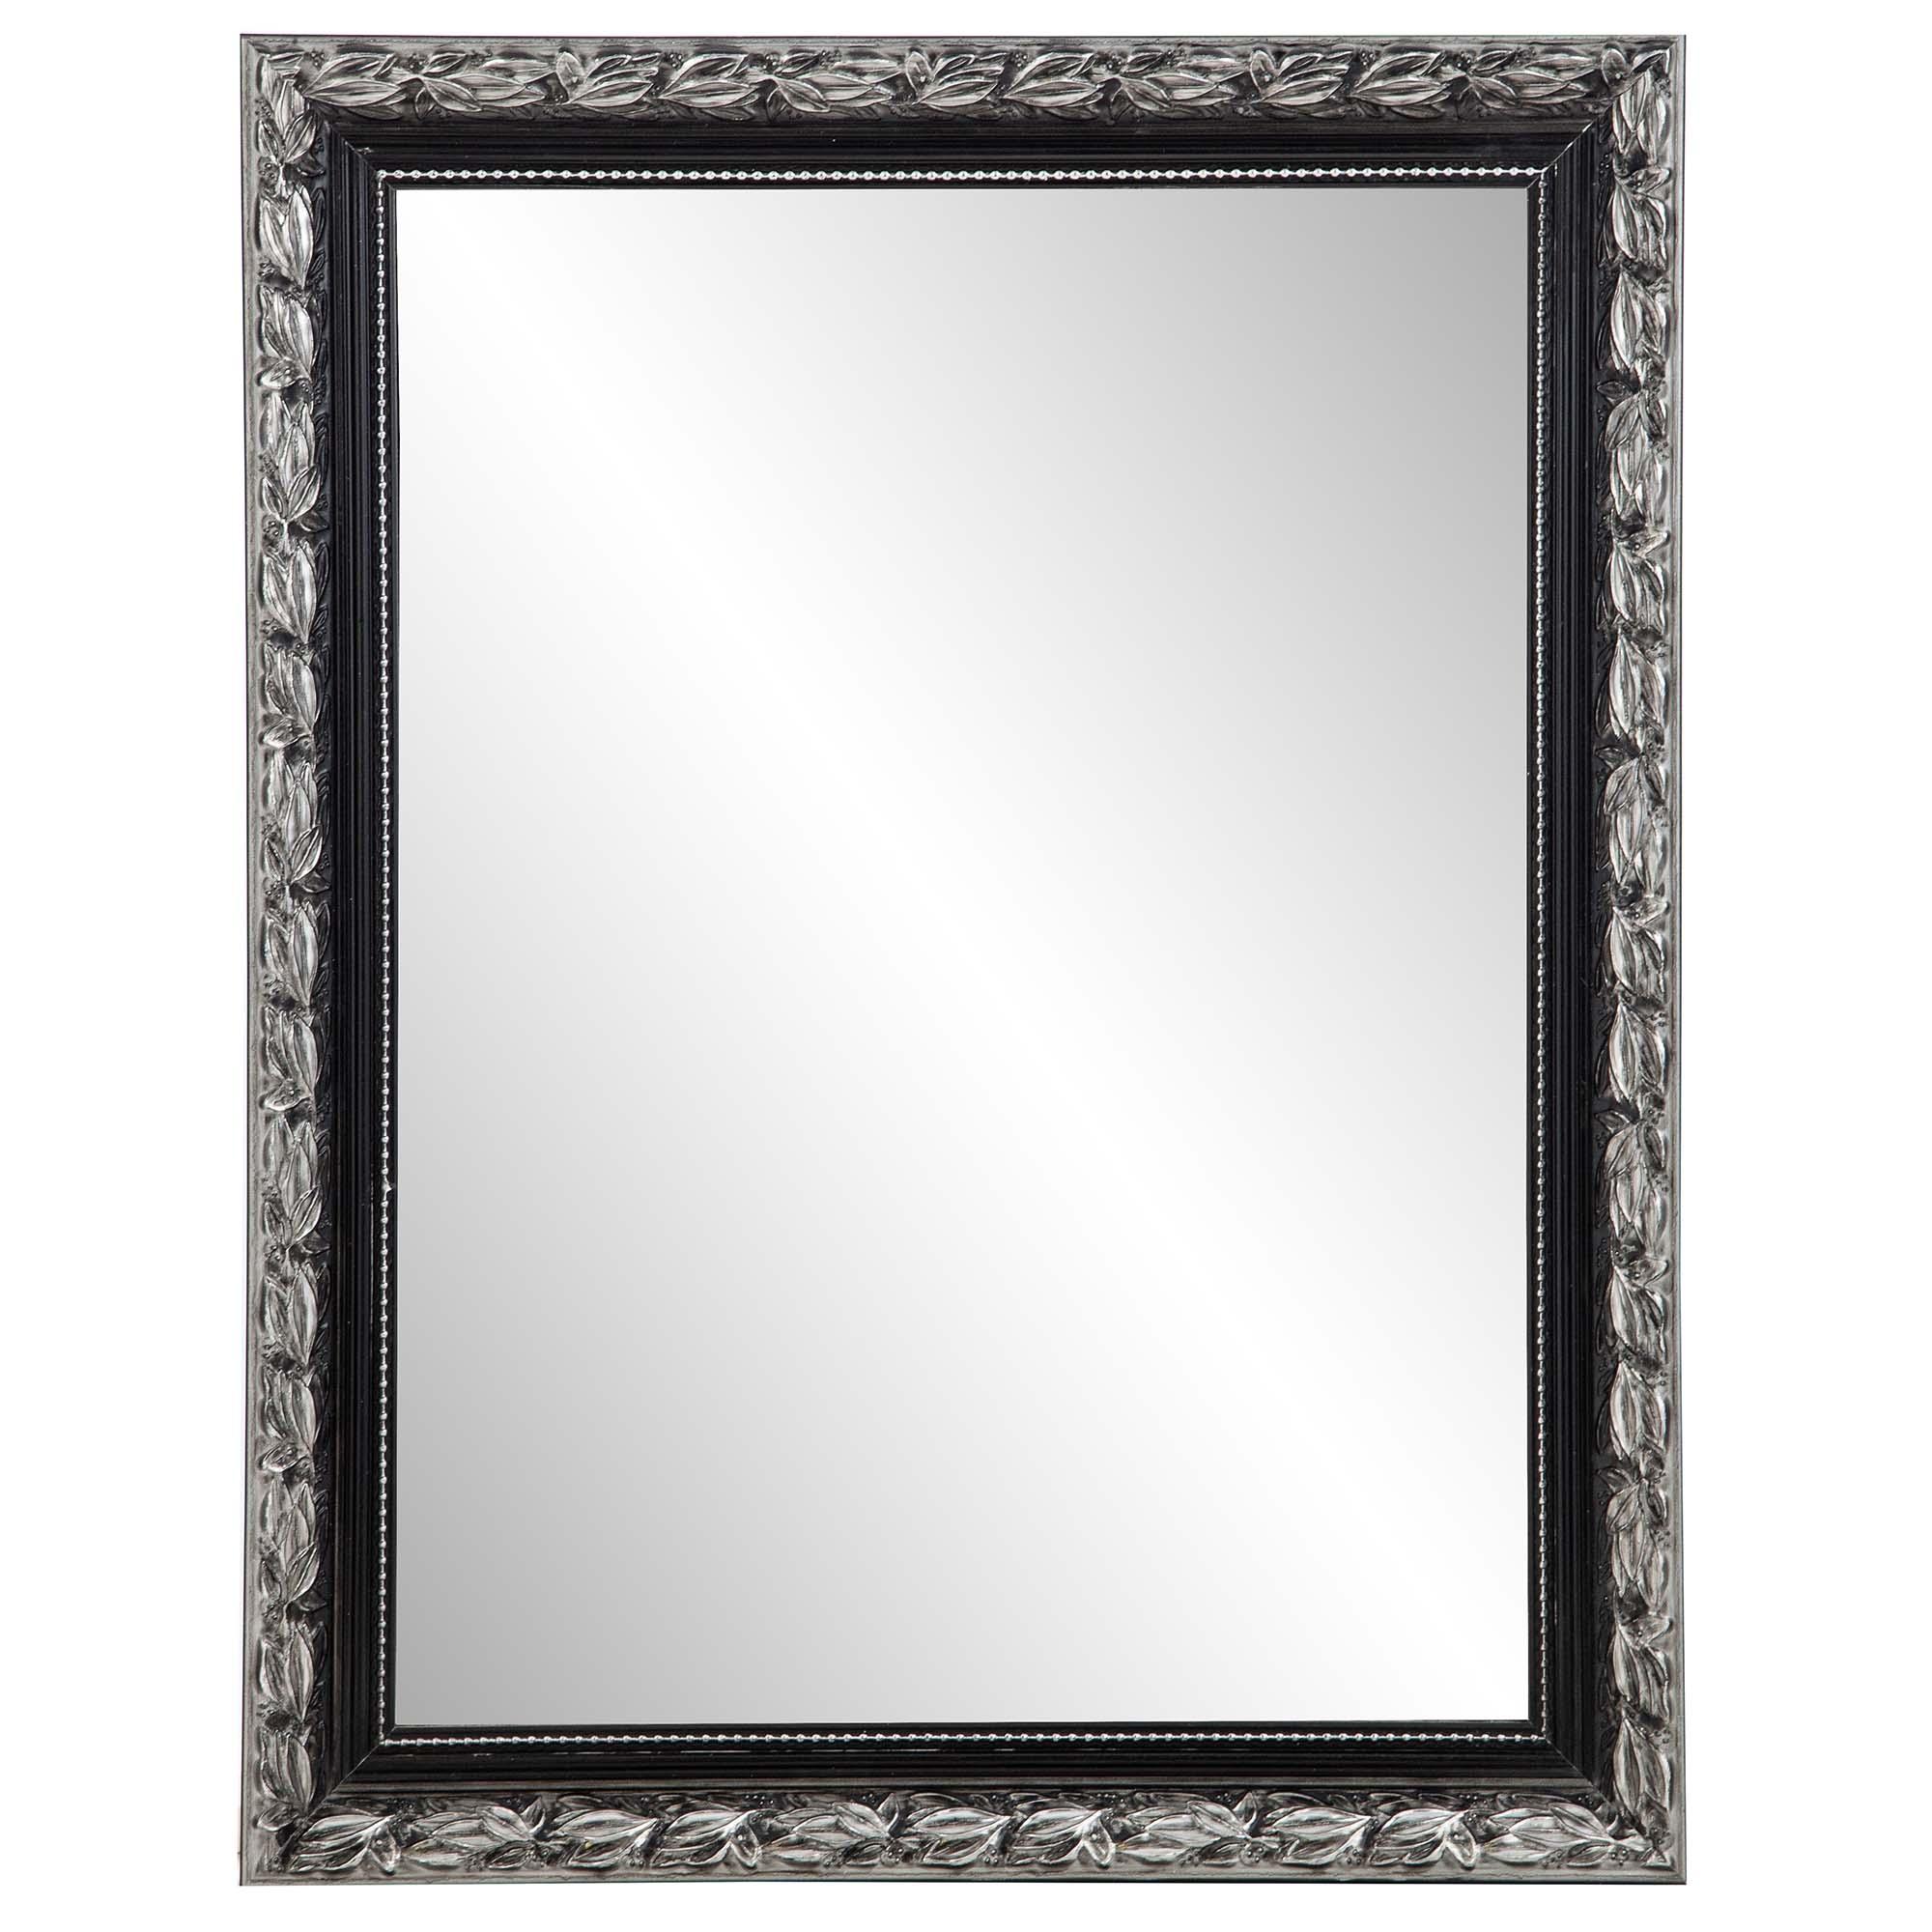 PIUS Rahmenspiegel 55x70